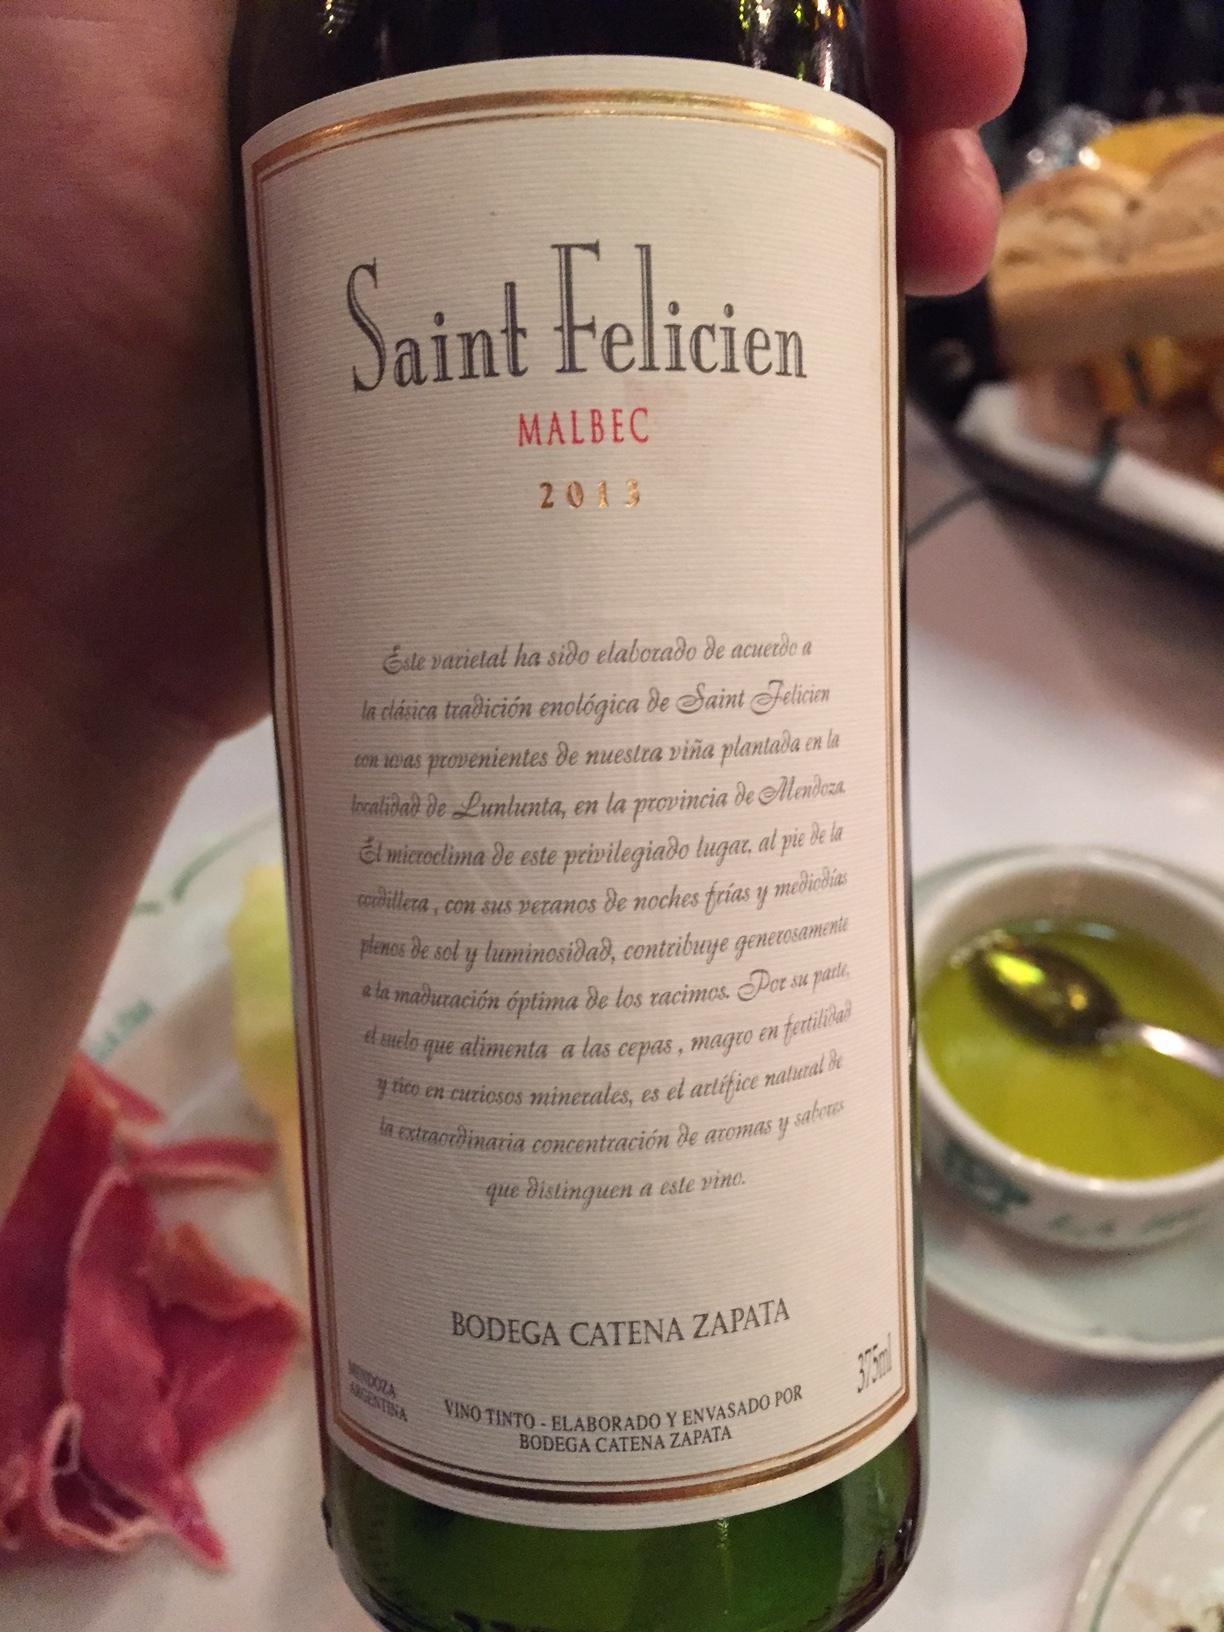 My new favorite type of wine. Malbec.